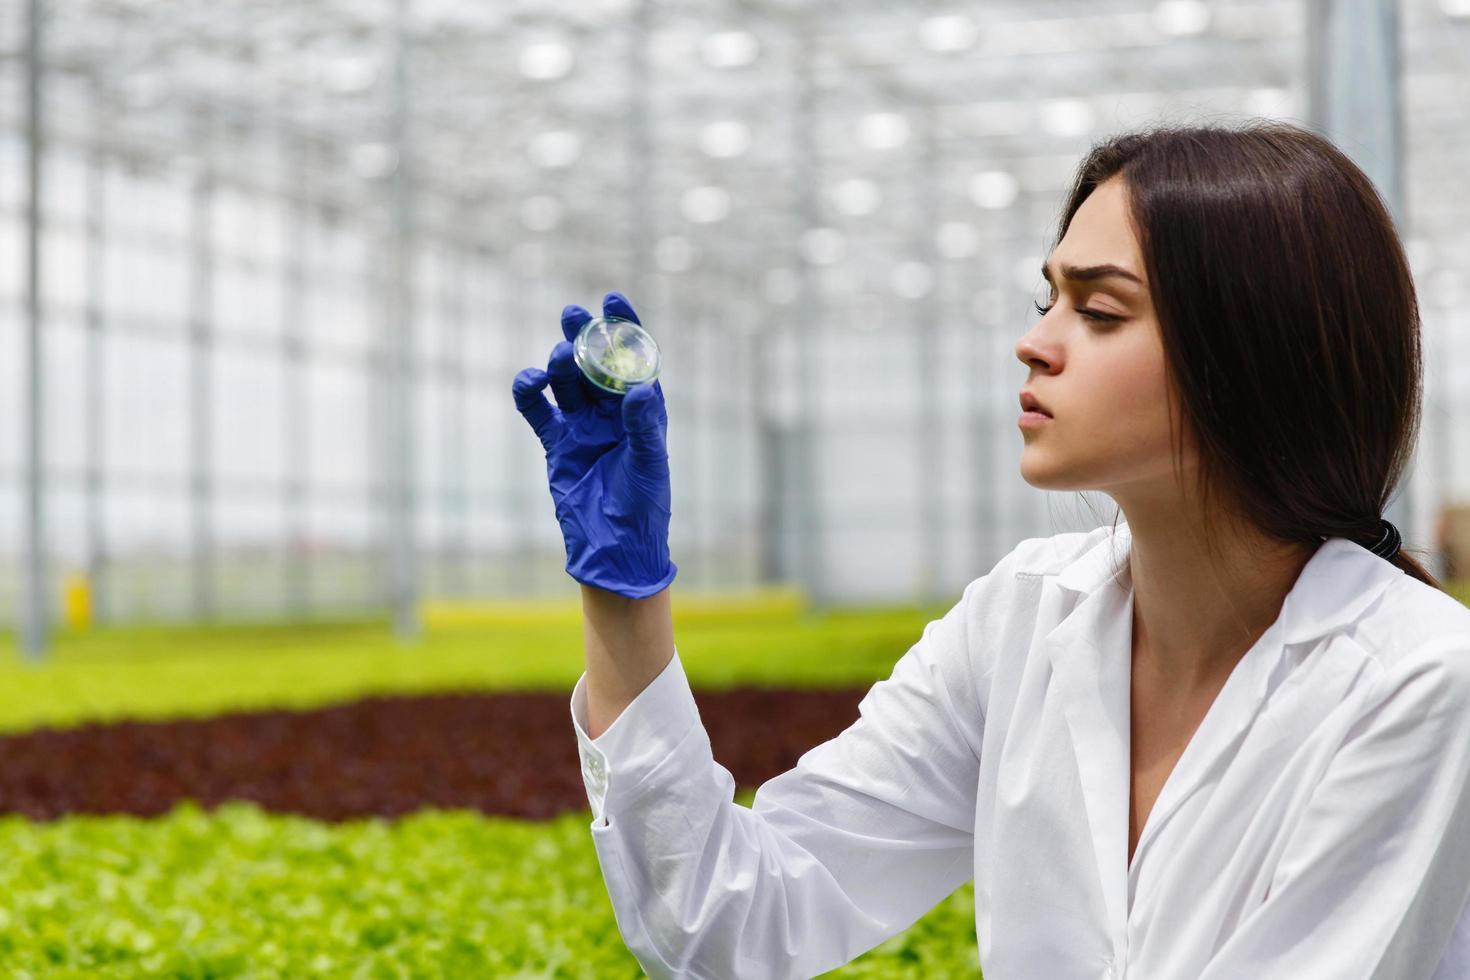 Female researcher looks at a greenery in Petri dish photo